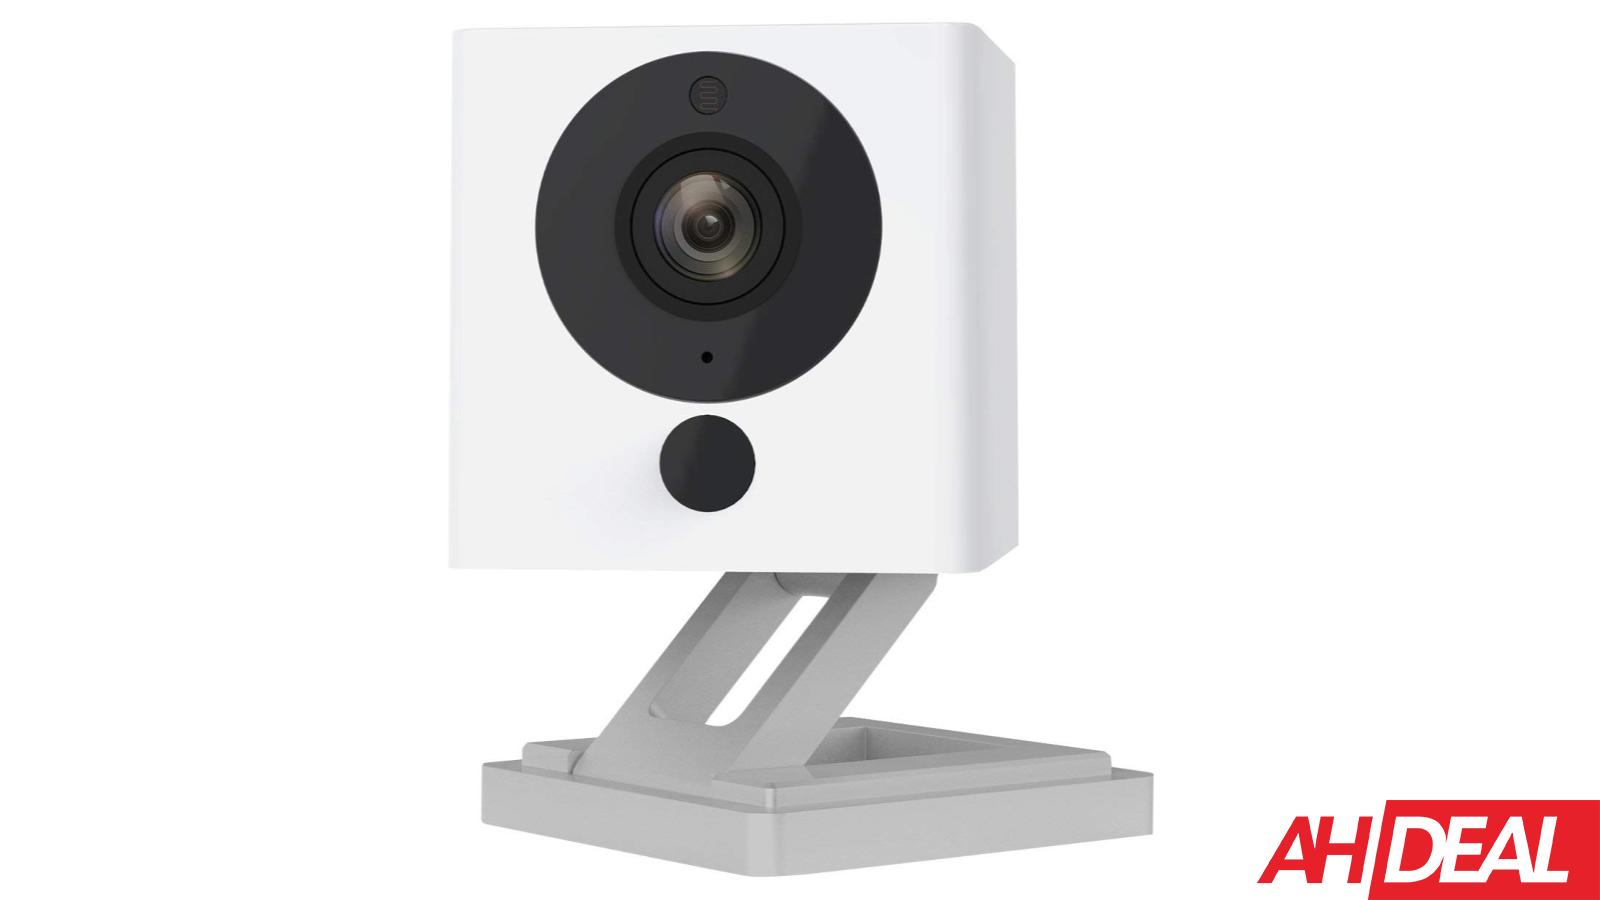 Wyze Cam 1080p HD Indoor Wireless Smart Home Camera $19.54 – Amazon's 12 Days of Deals 2018